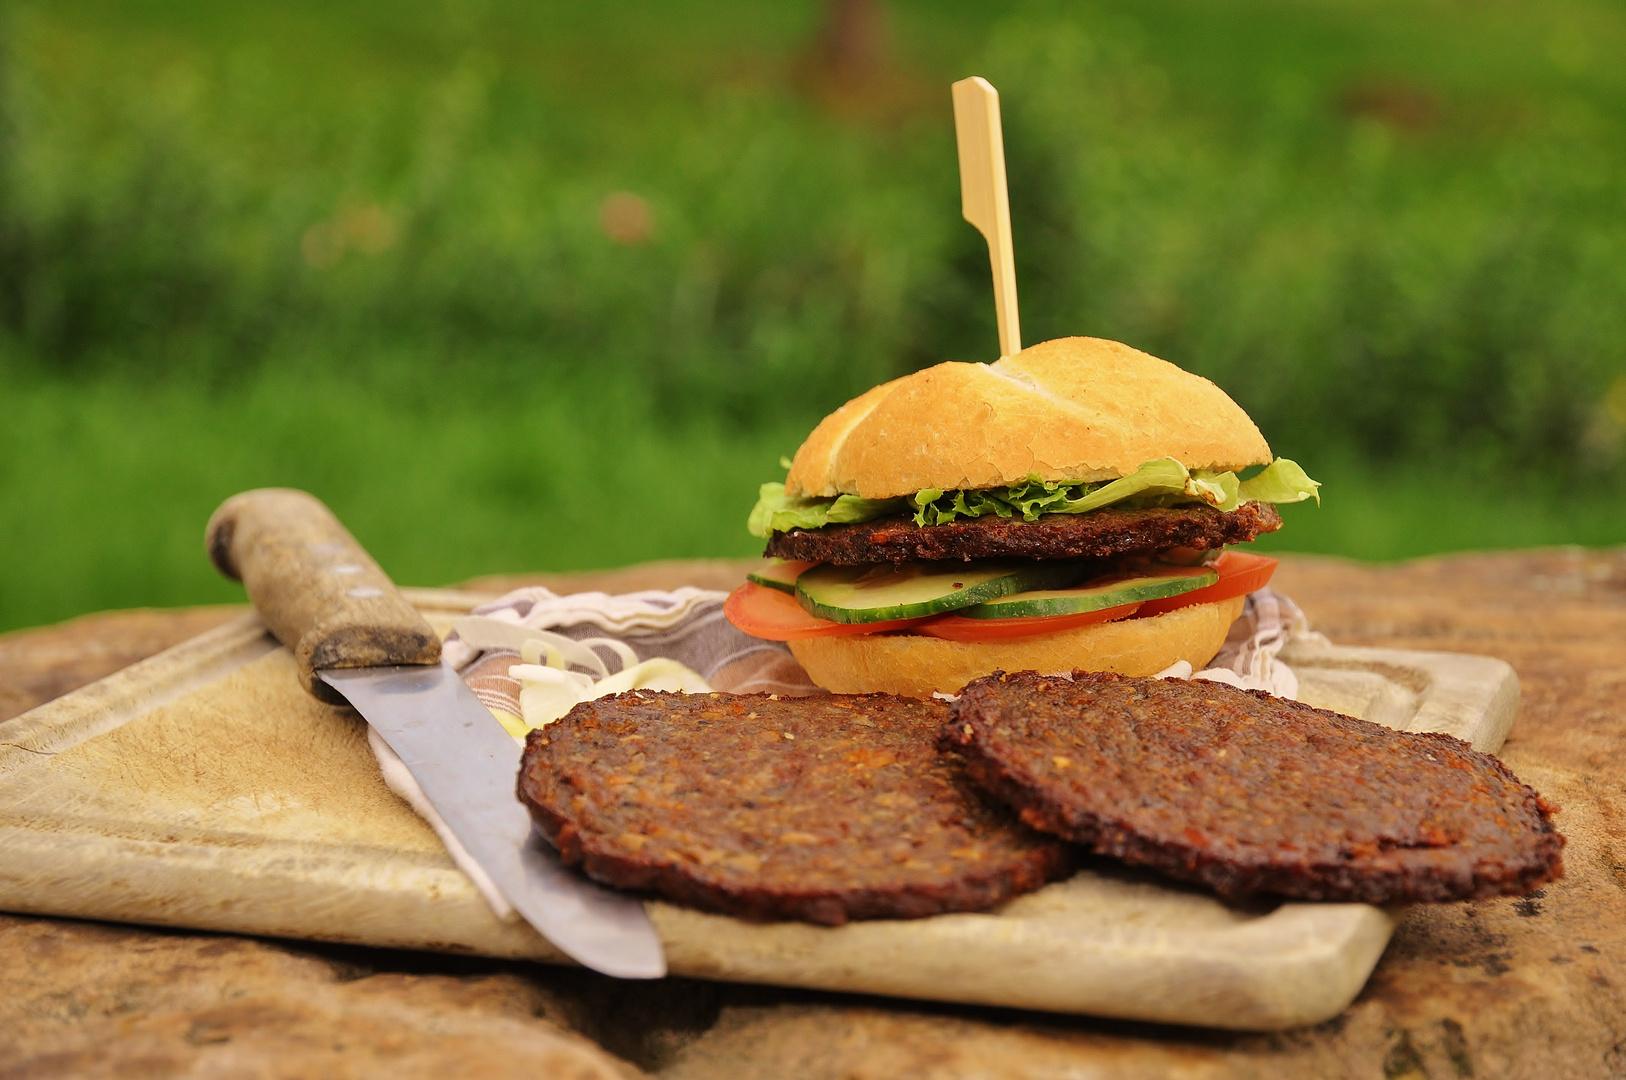 selbstgemachter Burger